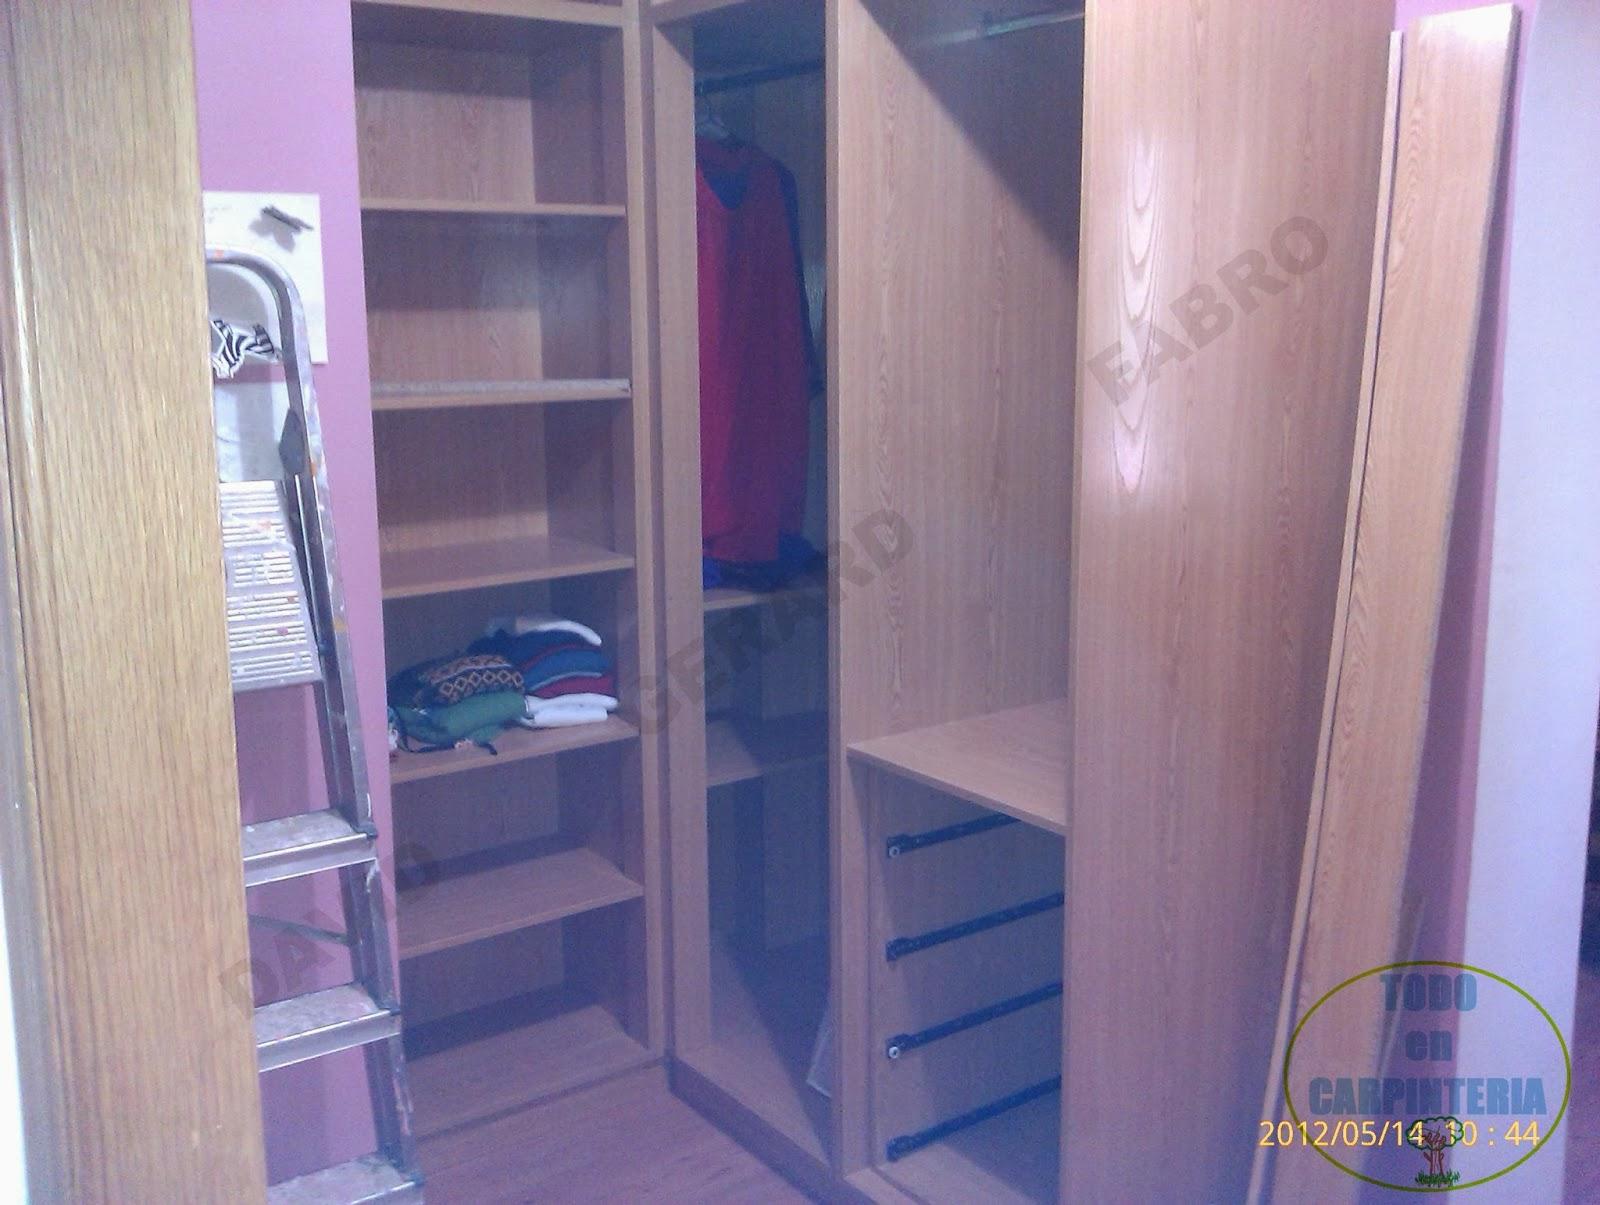 Interiores de armarios empotrados en esquina - Armario de esquina ...